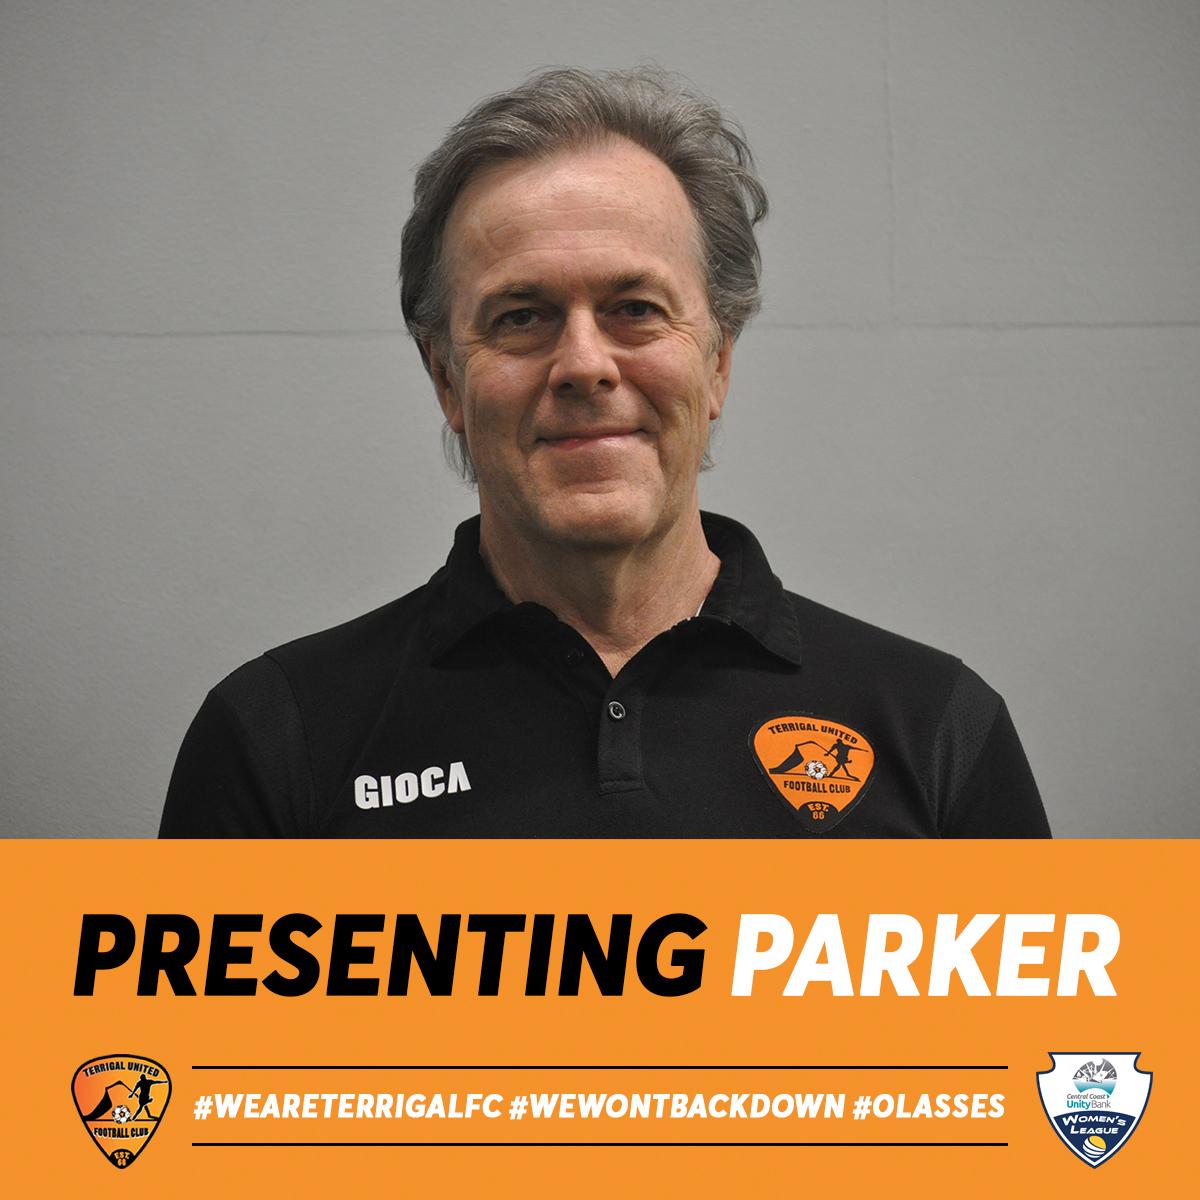 Presenting Parker